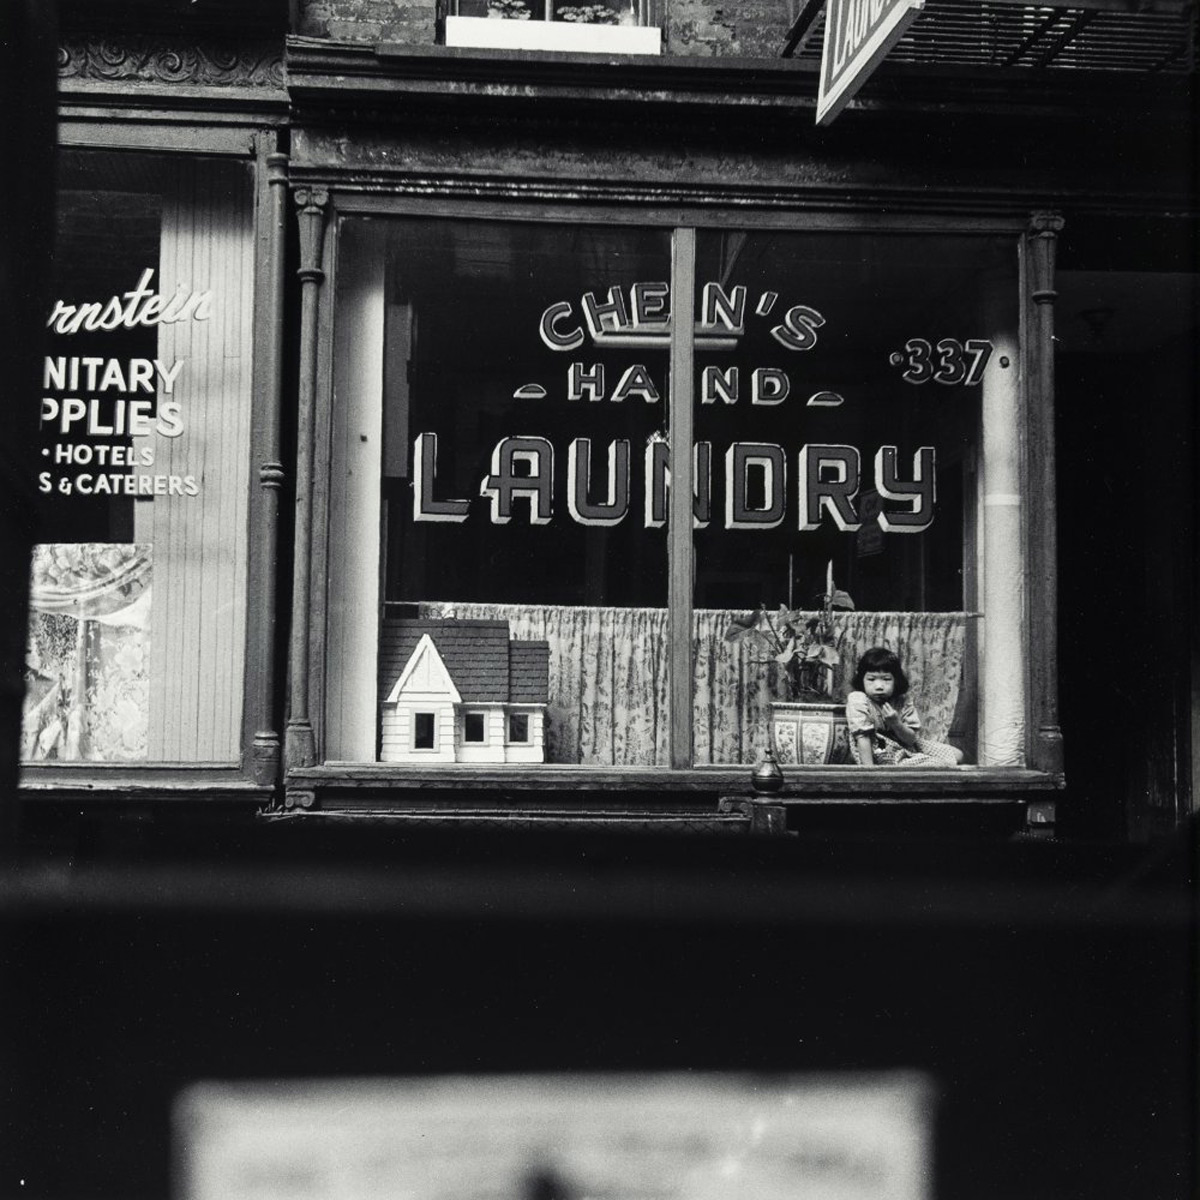 Robert Rauschenberg Laundry-New York City, 1979 Photograph, edition of 50 34 x 34 cm